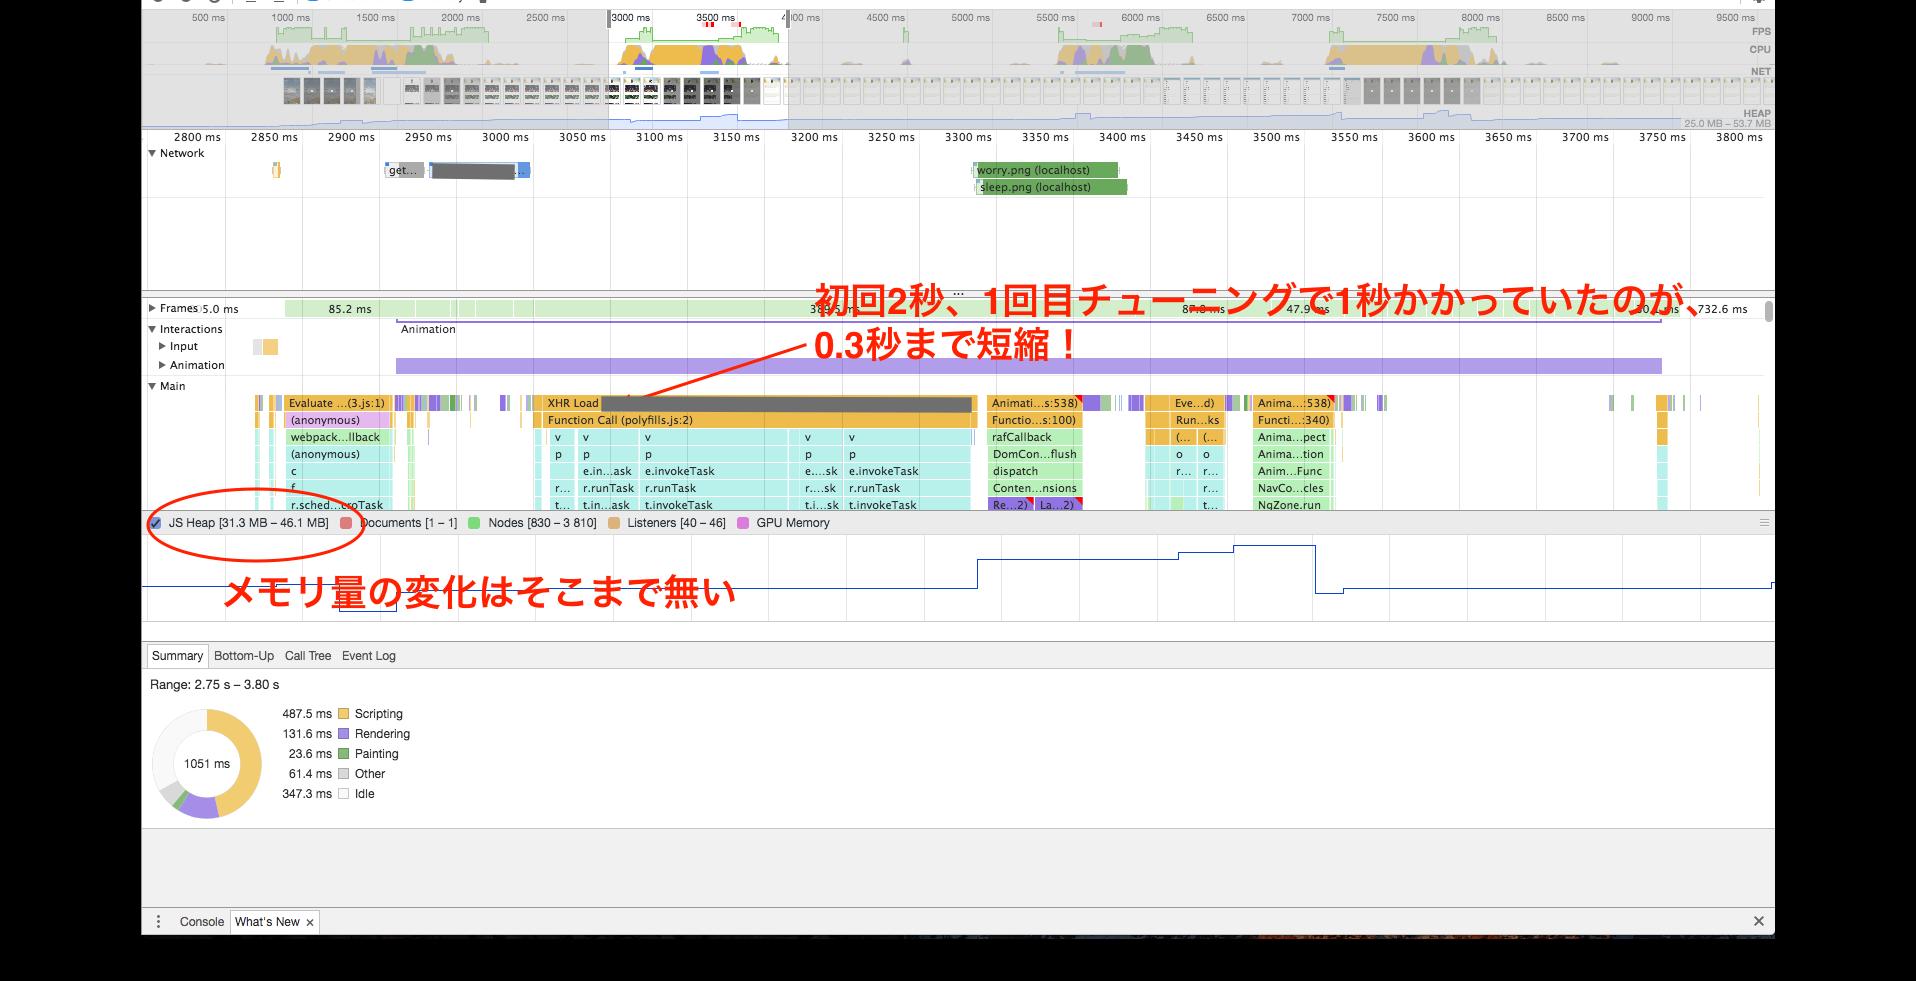 Qiita_3_スクロールによる差分データ表示_記録を見る画面.png